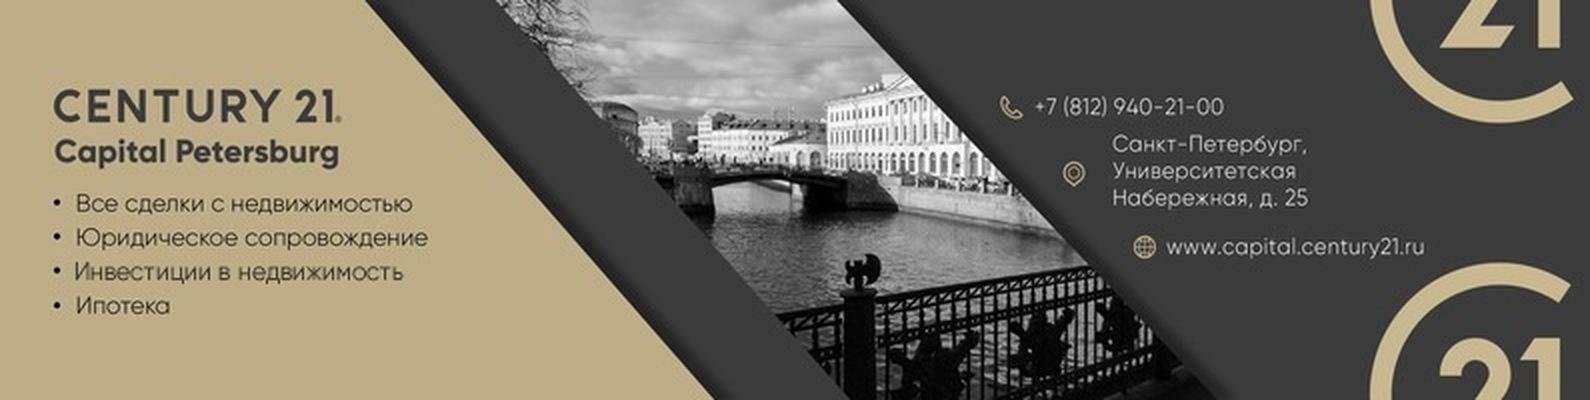 Агентство Недвижимости CENTURY21 Capital-SPb | ВКонтакте